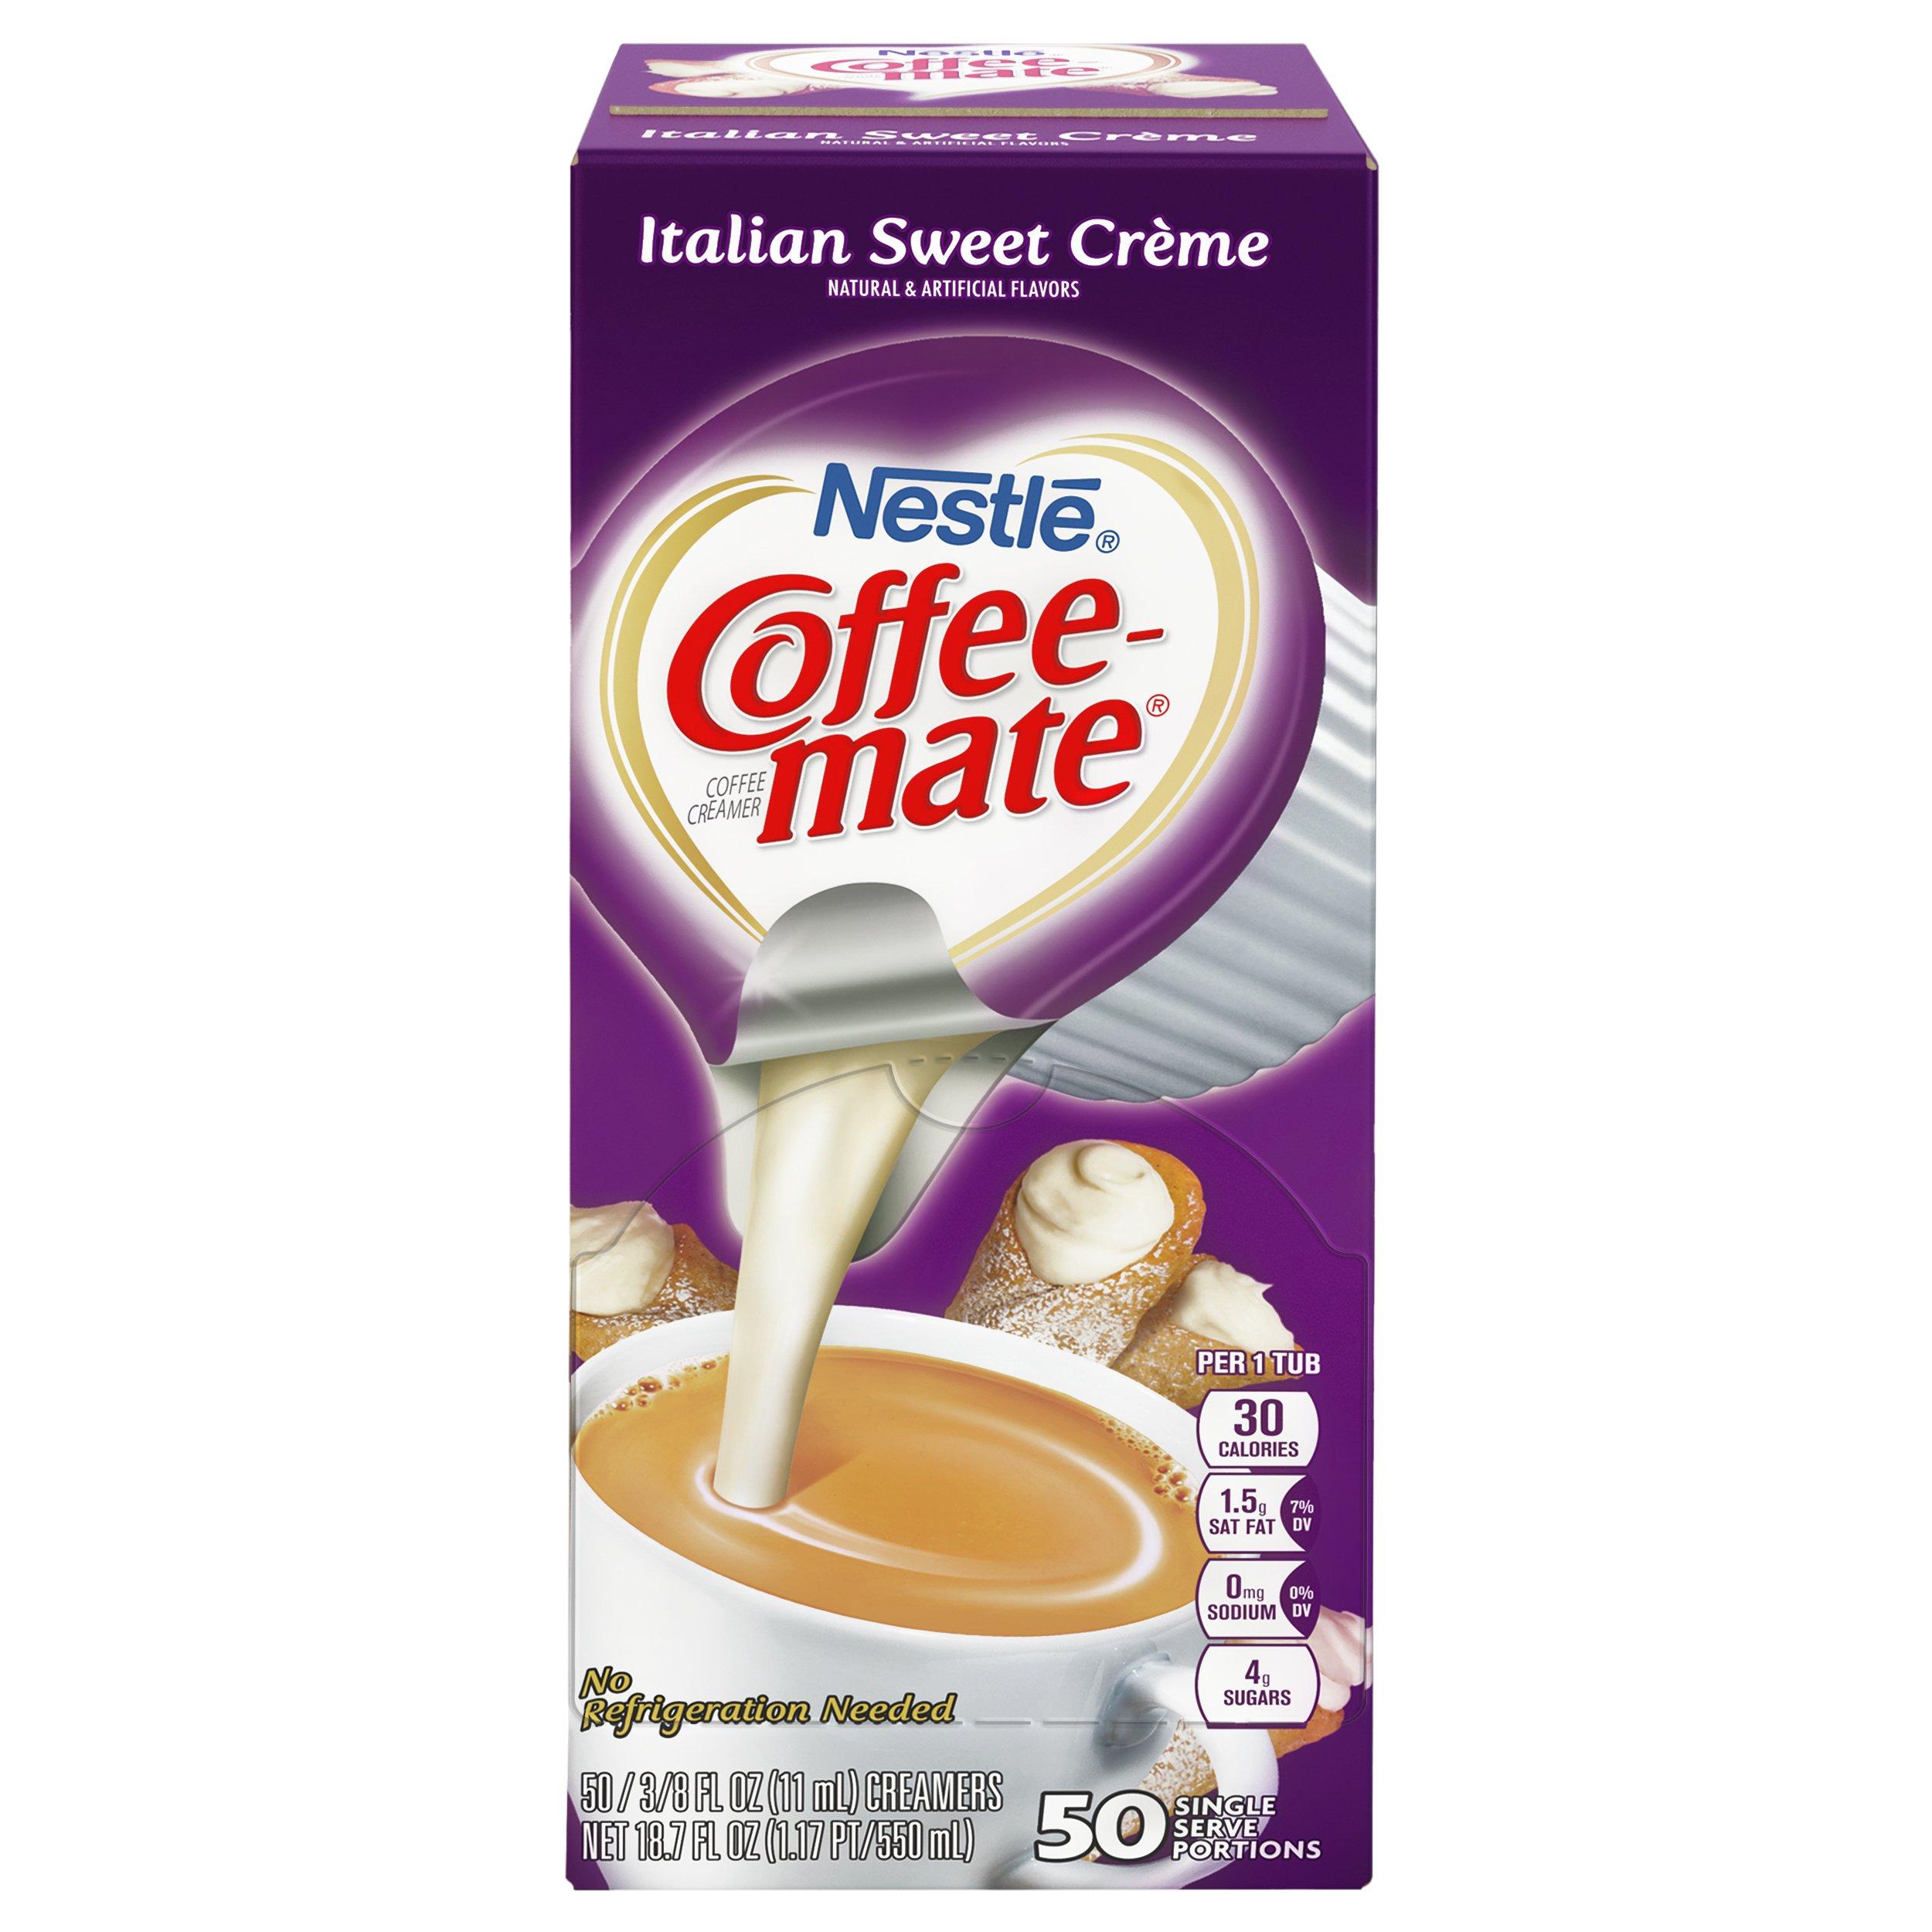 NESTLE COFFEE-MATE Coffee Creamer, Italian Sweet Creme, liquid creamer singles, Pack of 200 by Nestle Coffee Mate (Image #2)